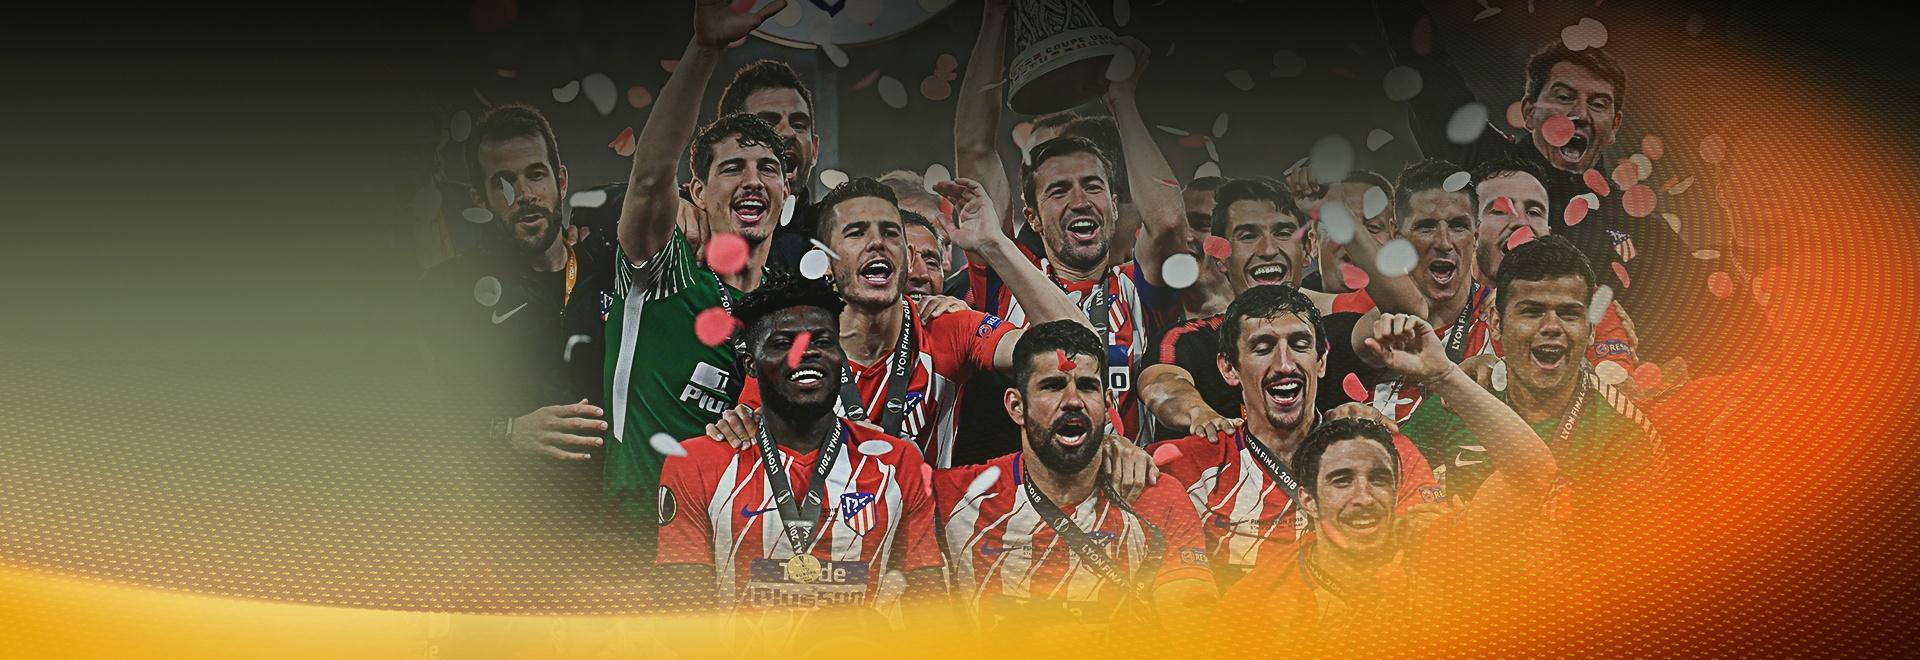 2017/2018: Atletico Madrid